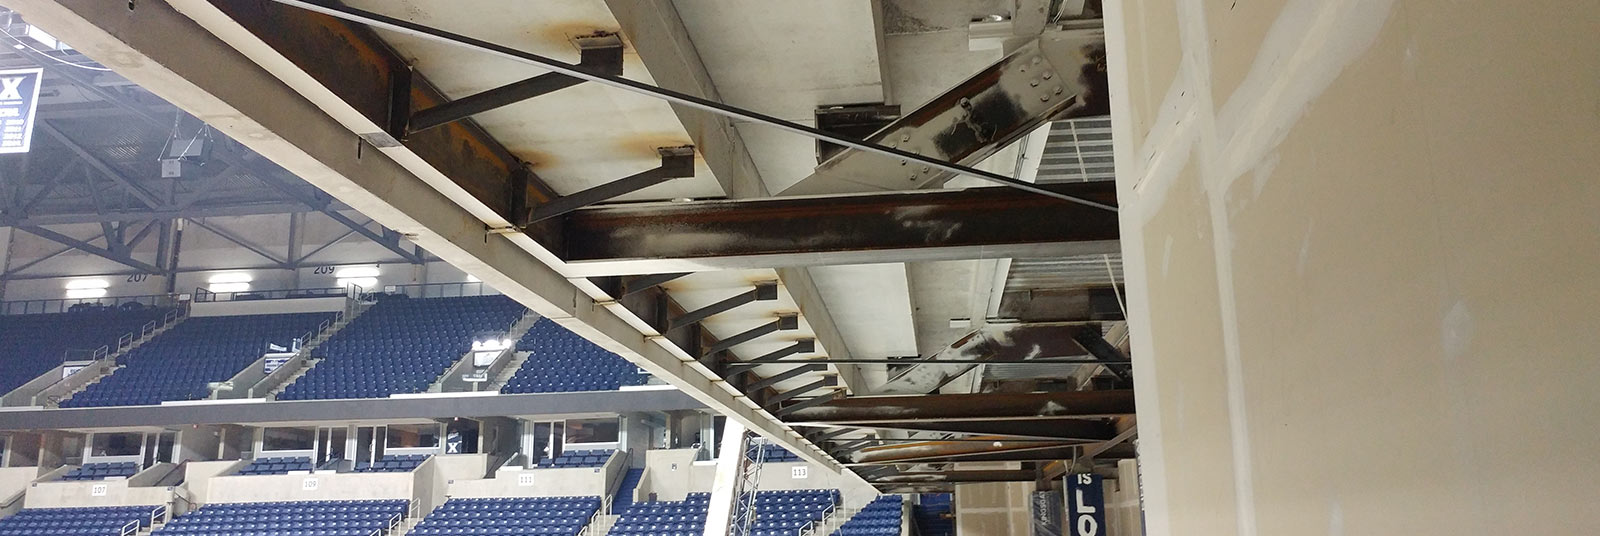 Cantilevered seating bowl addition at Xavier University Cintas Center in Cincinnati, Ohio.